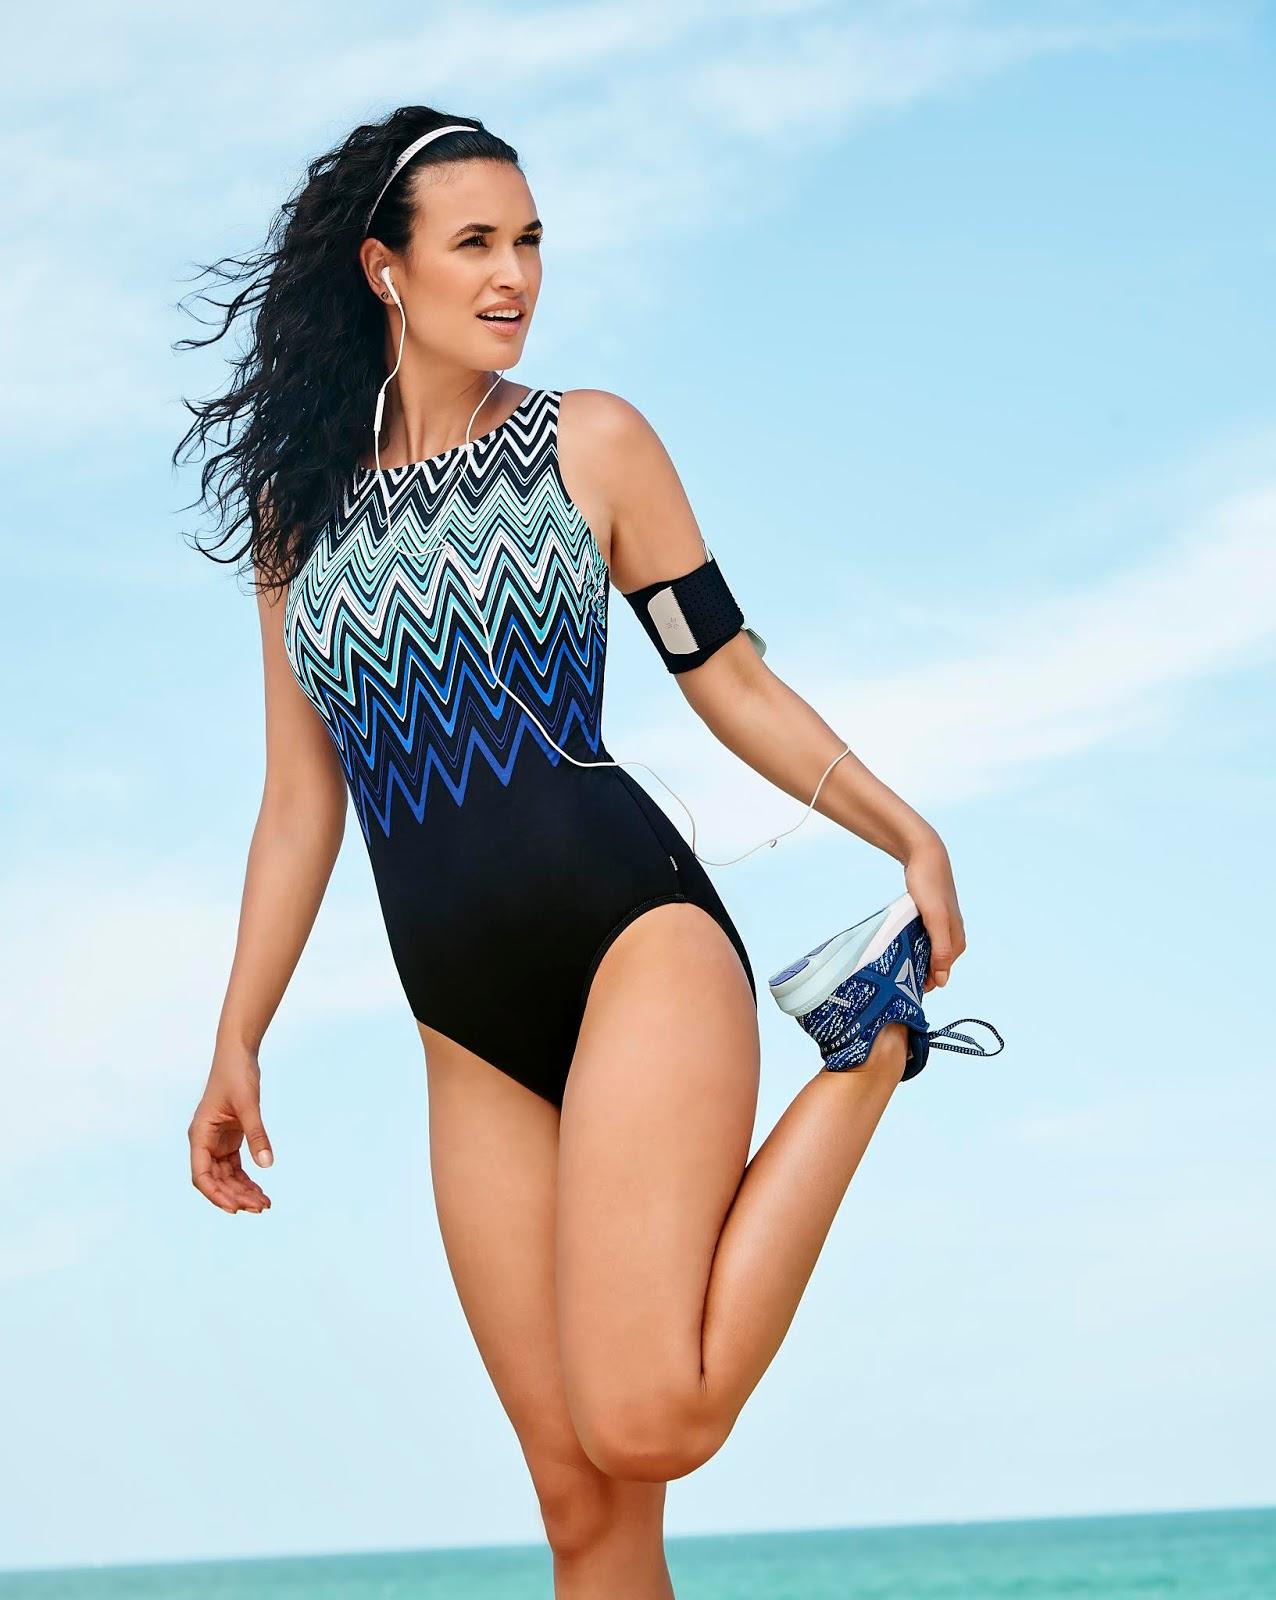 Miami Swim Week | 2019 Reebok Lifestyle at Swim Show